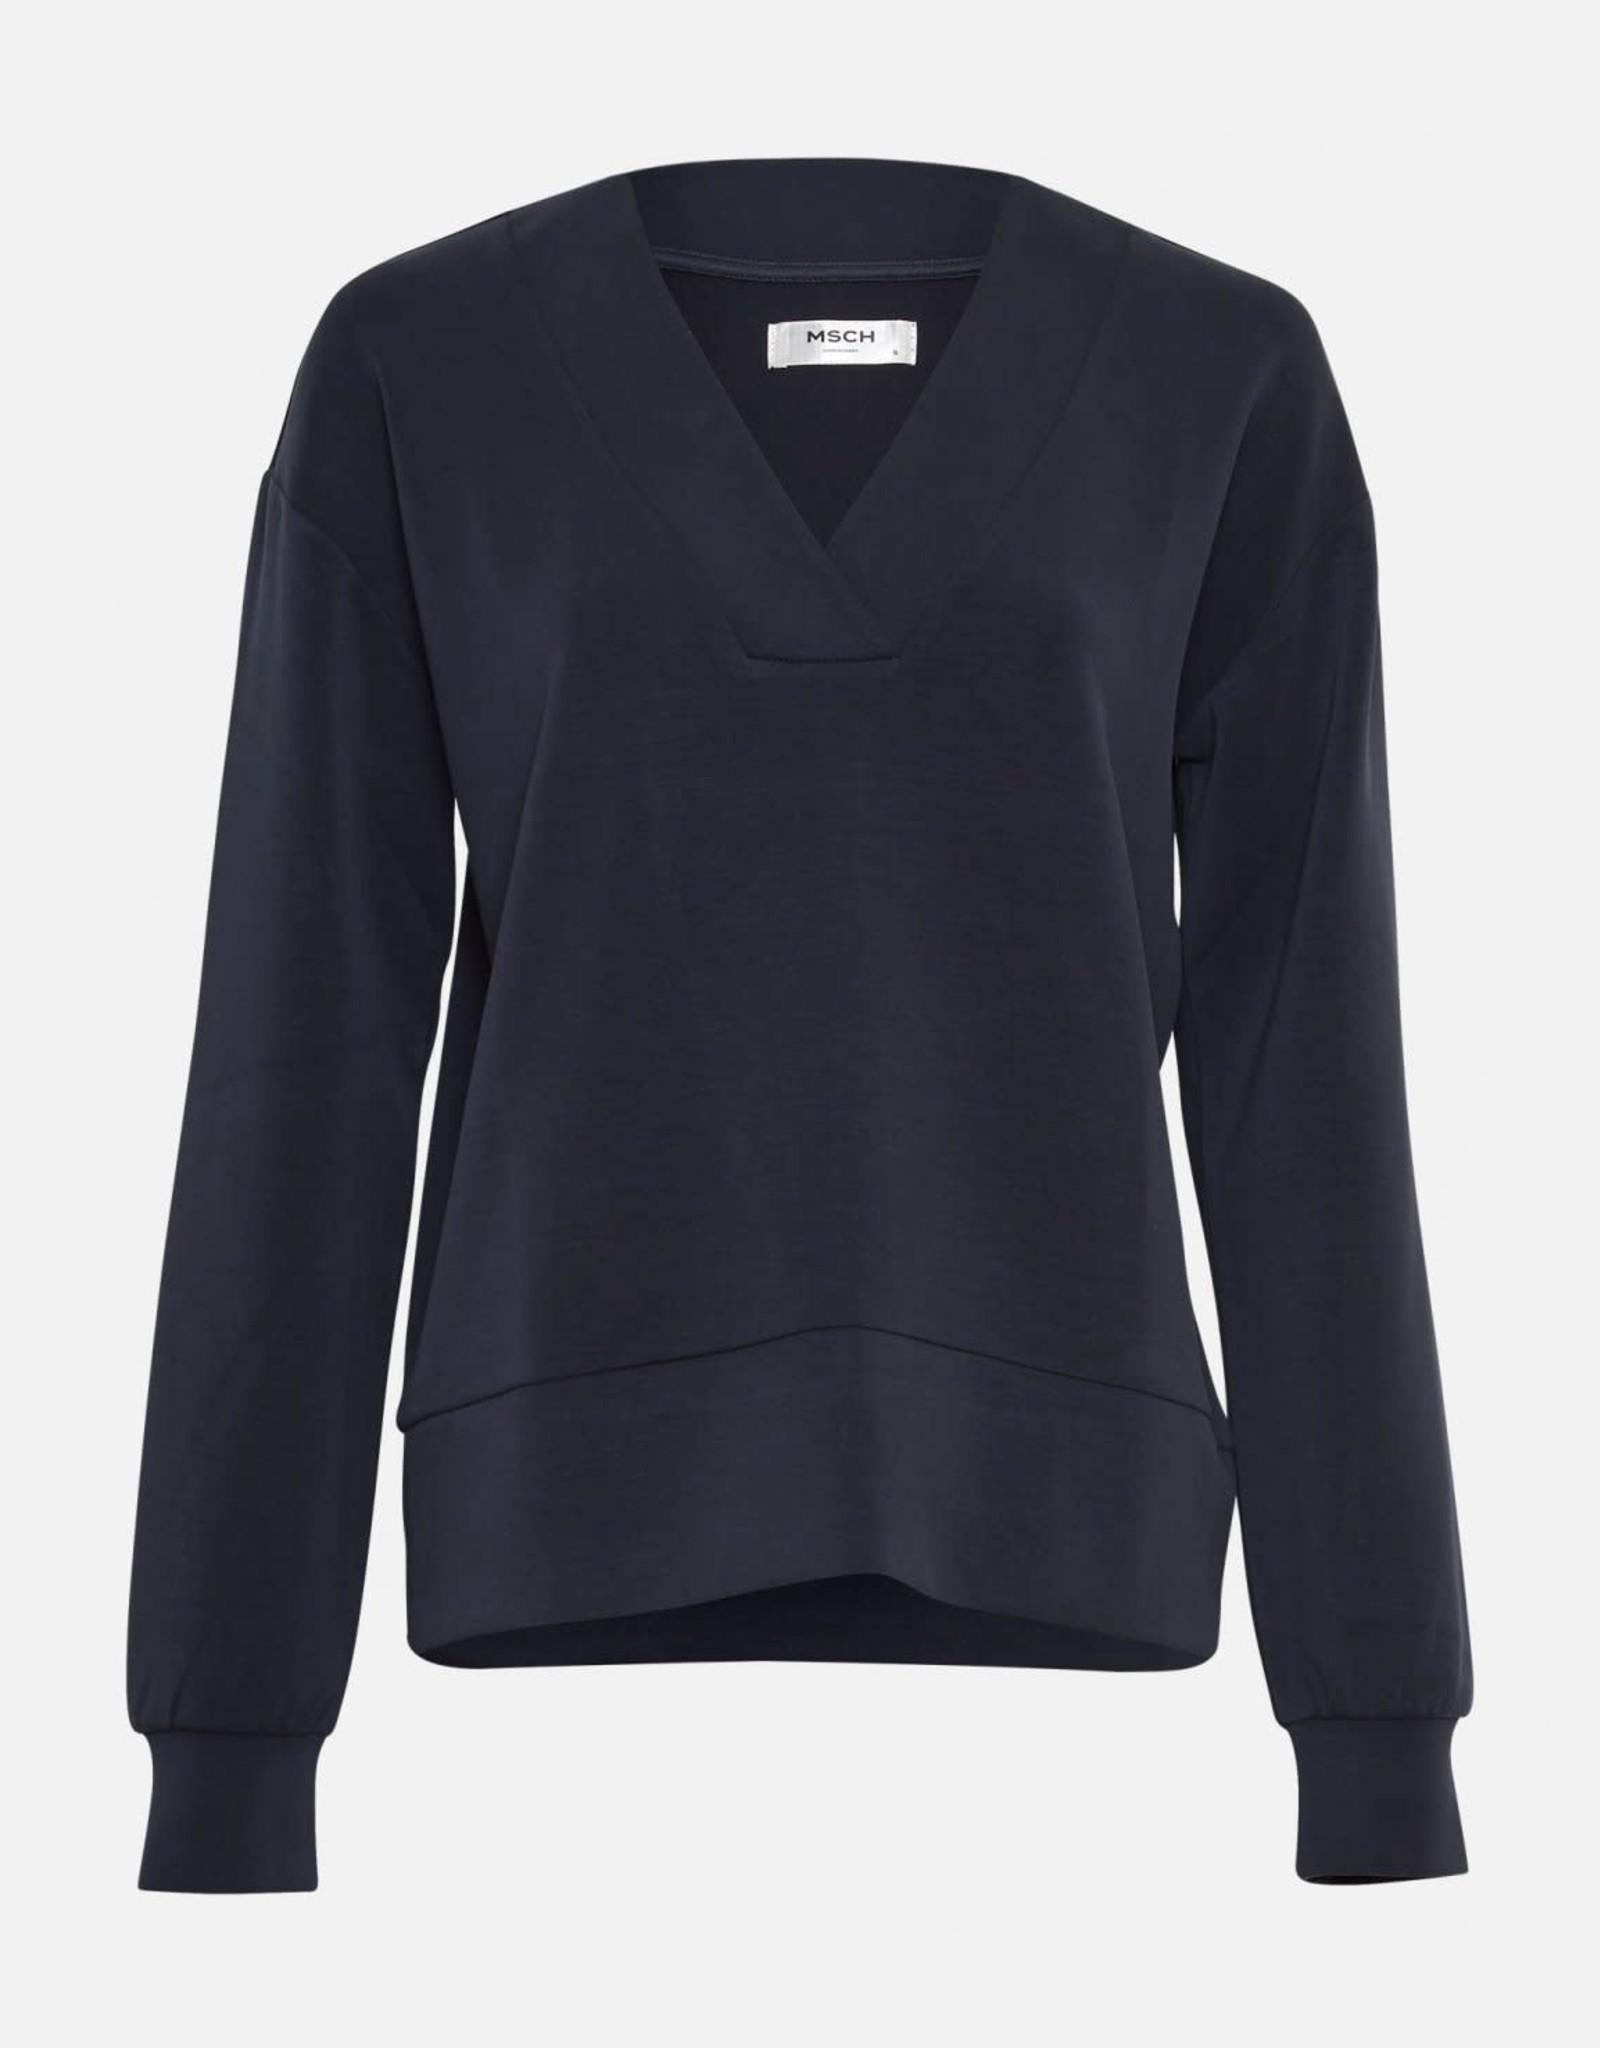 Moss Copenhagen MSCH Merla LS Sweater